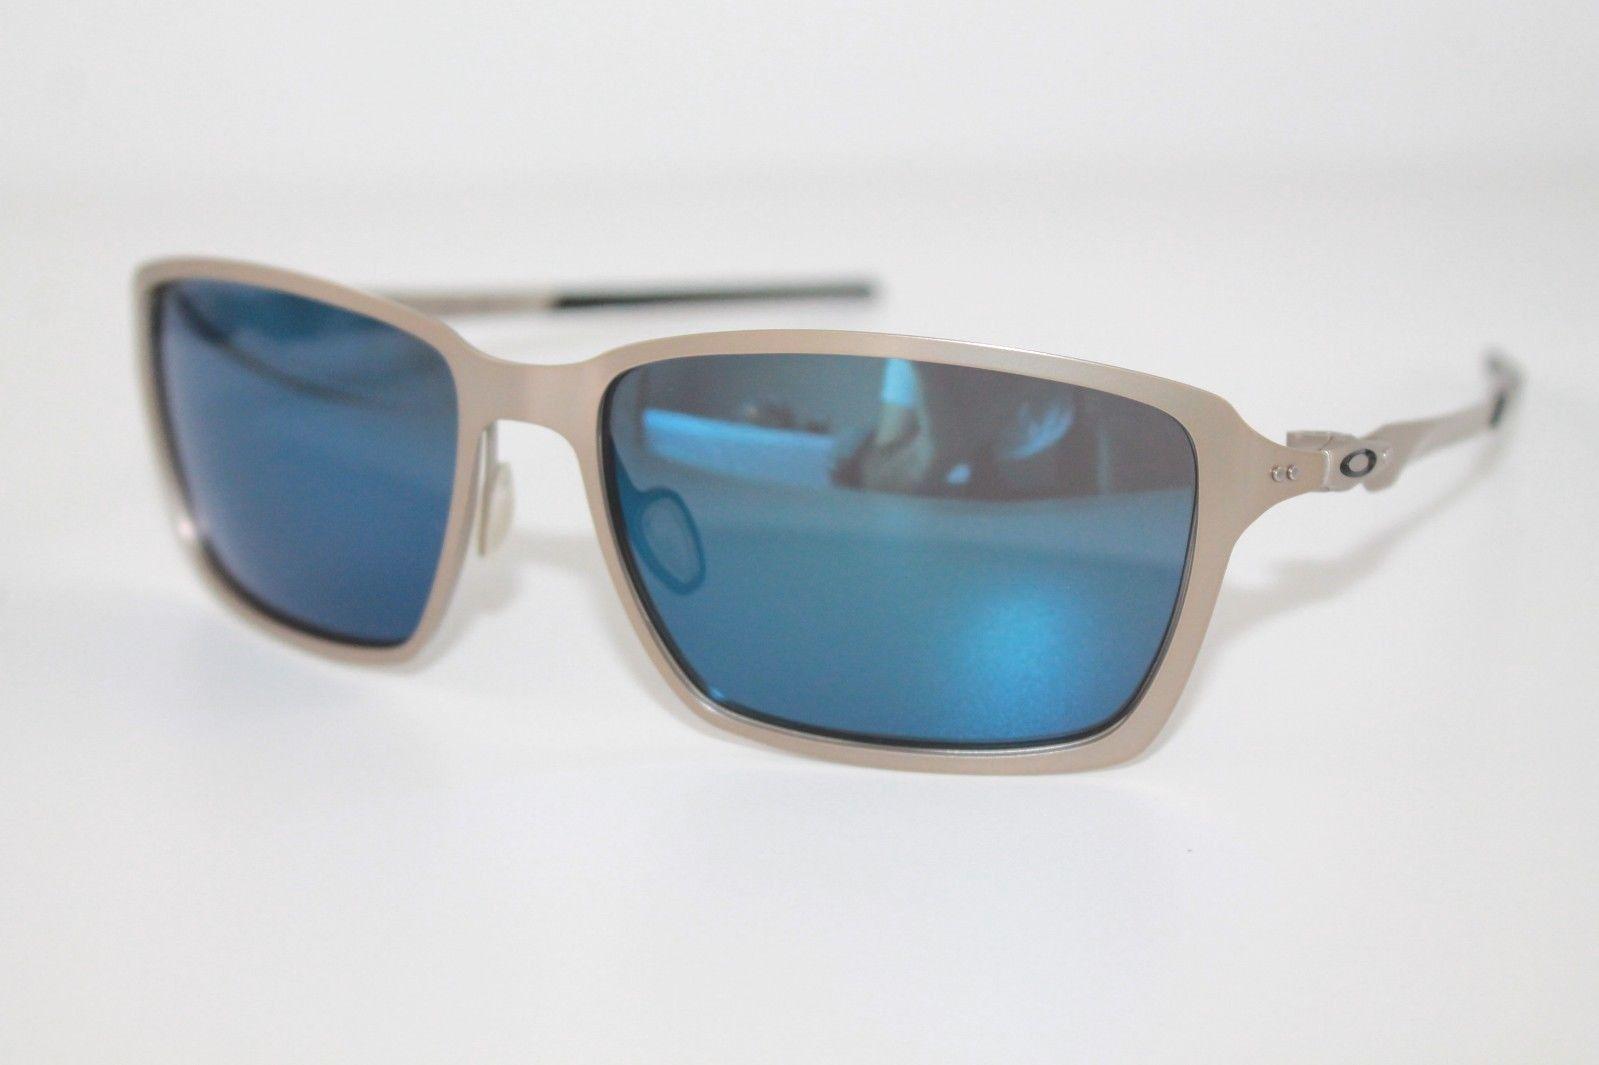 ca5878619c39d 57. 57. Previous. Oakley Tincan Sunglasses OO4082-04 Light Frame W  Ice  Iridium Lens Metal. Oakley ...